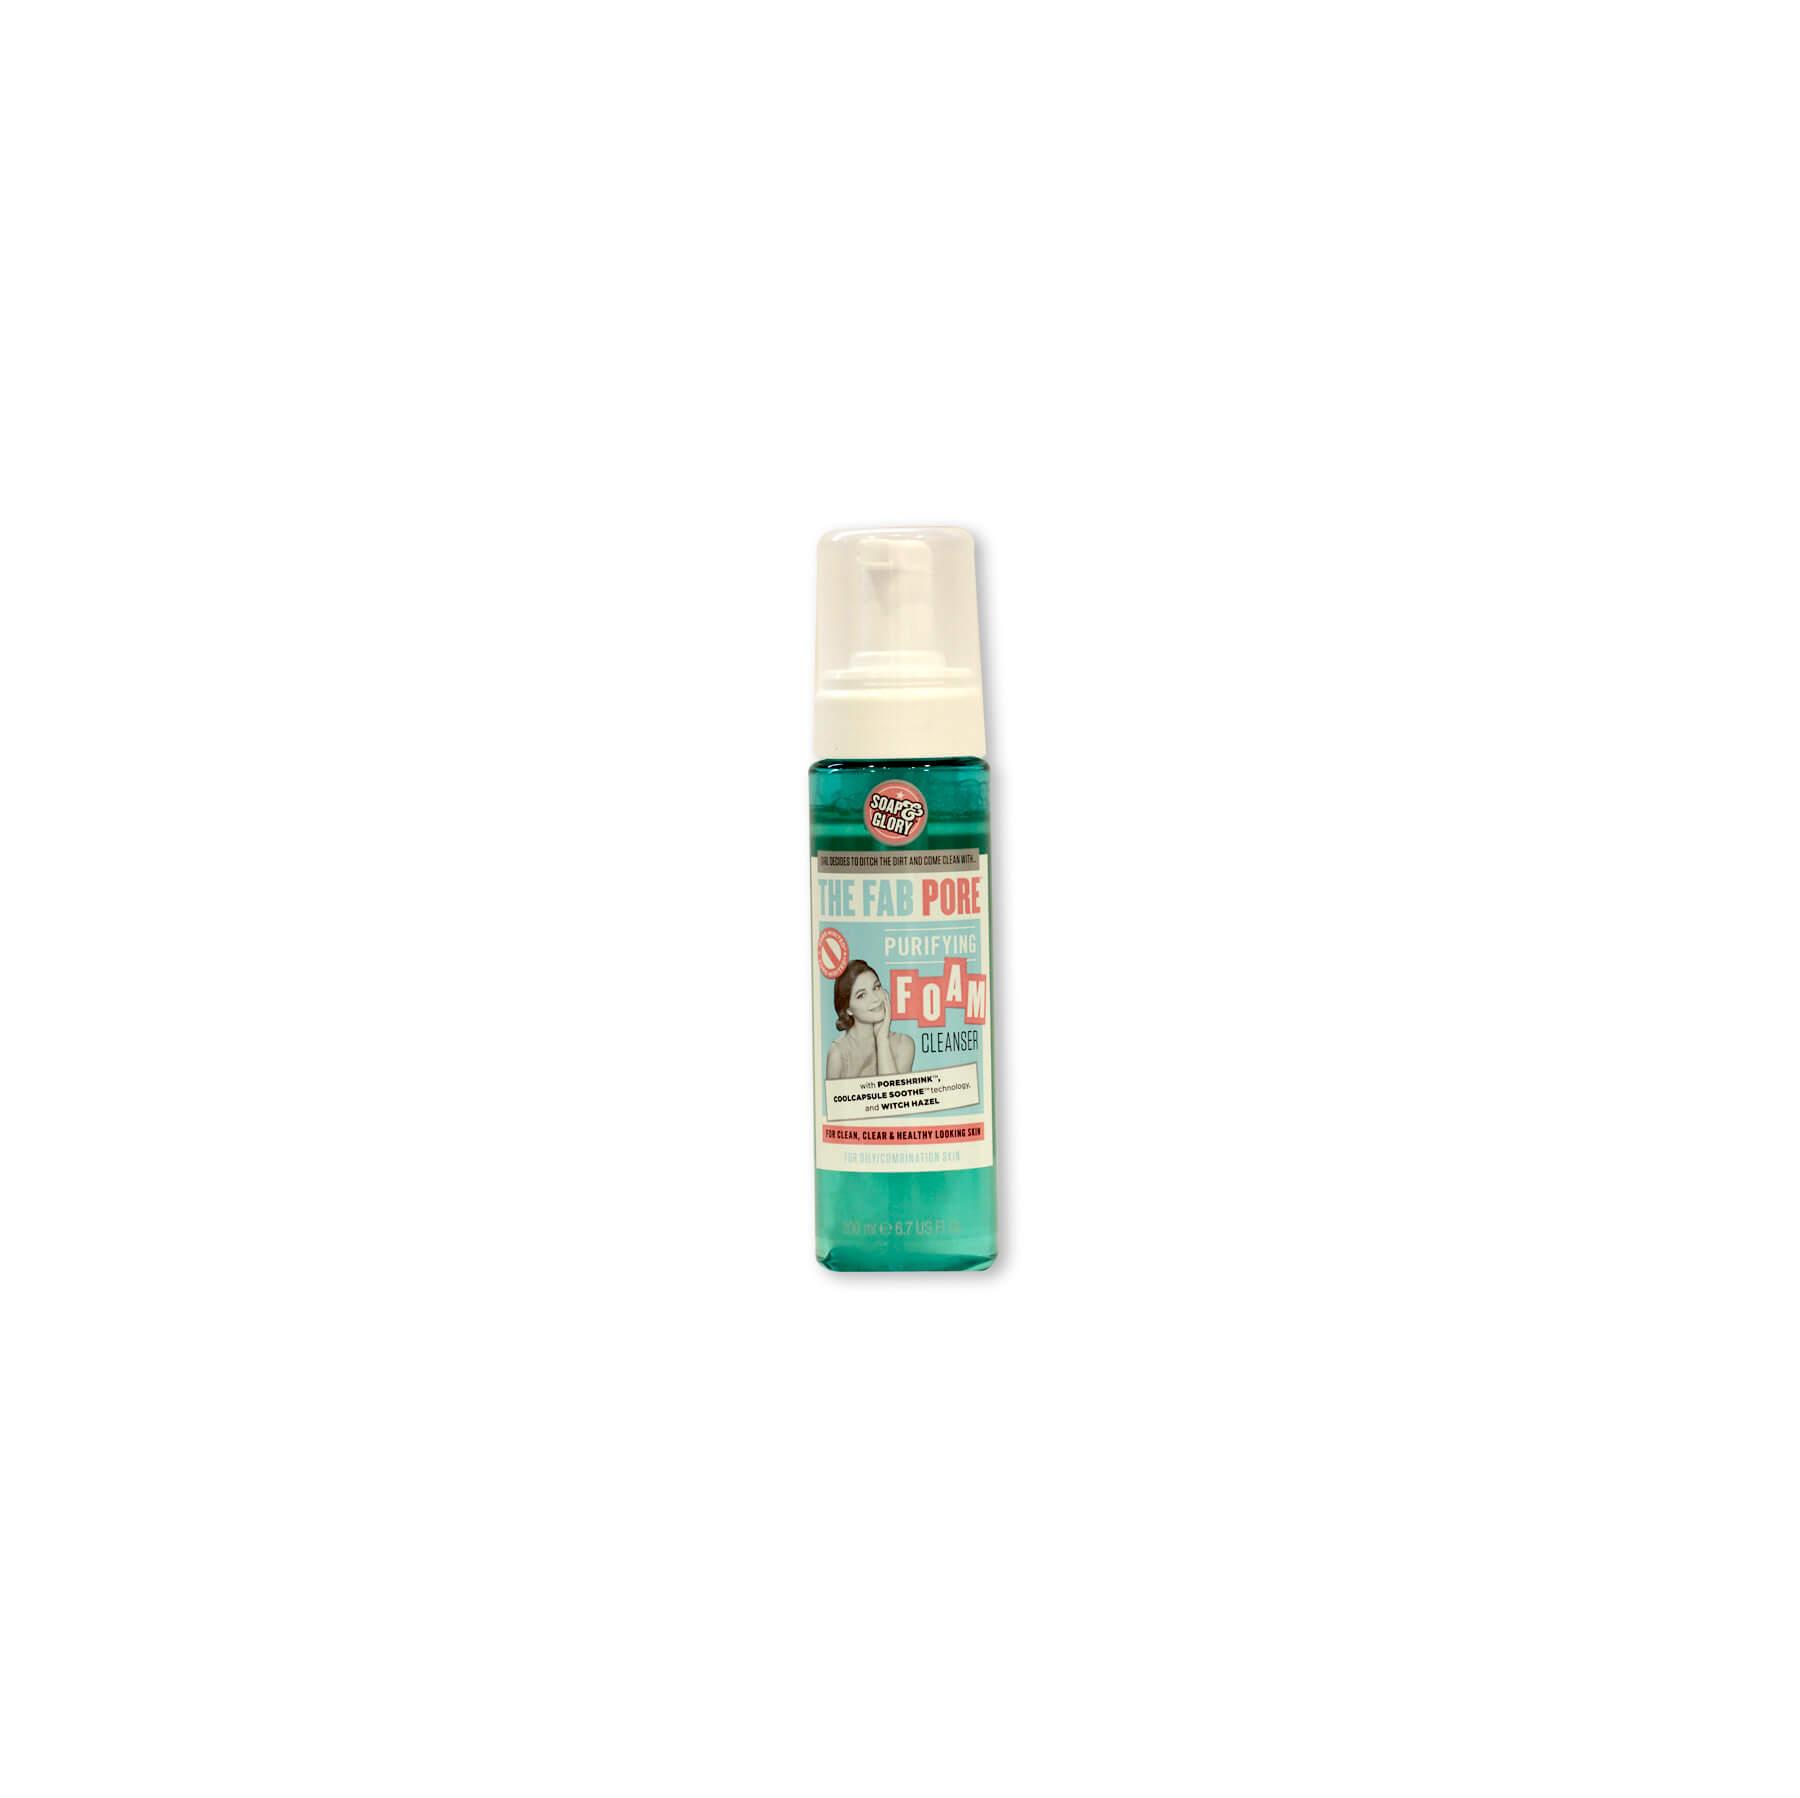 soap & glory espuma de limpieza facial the fab pore x 1 unidad